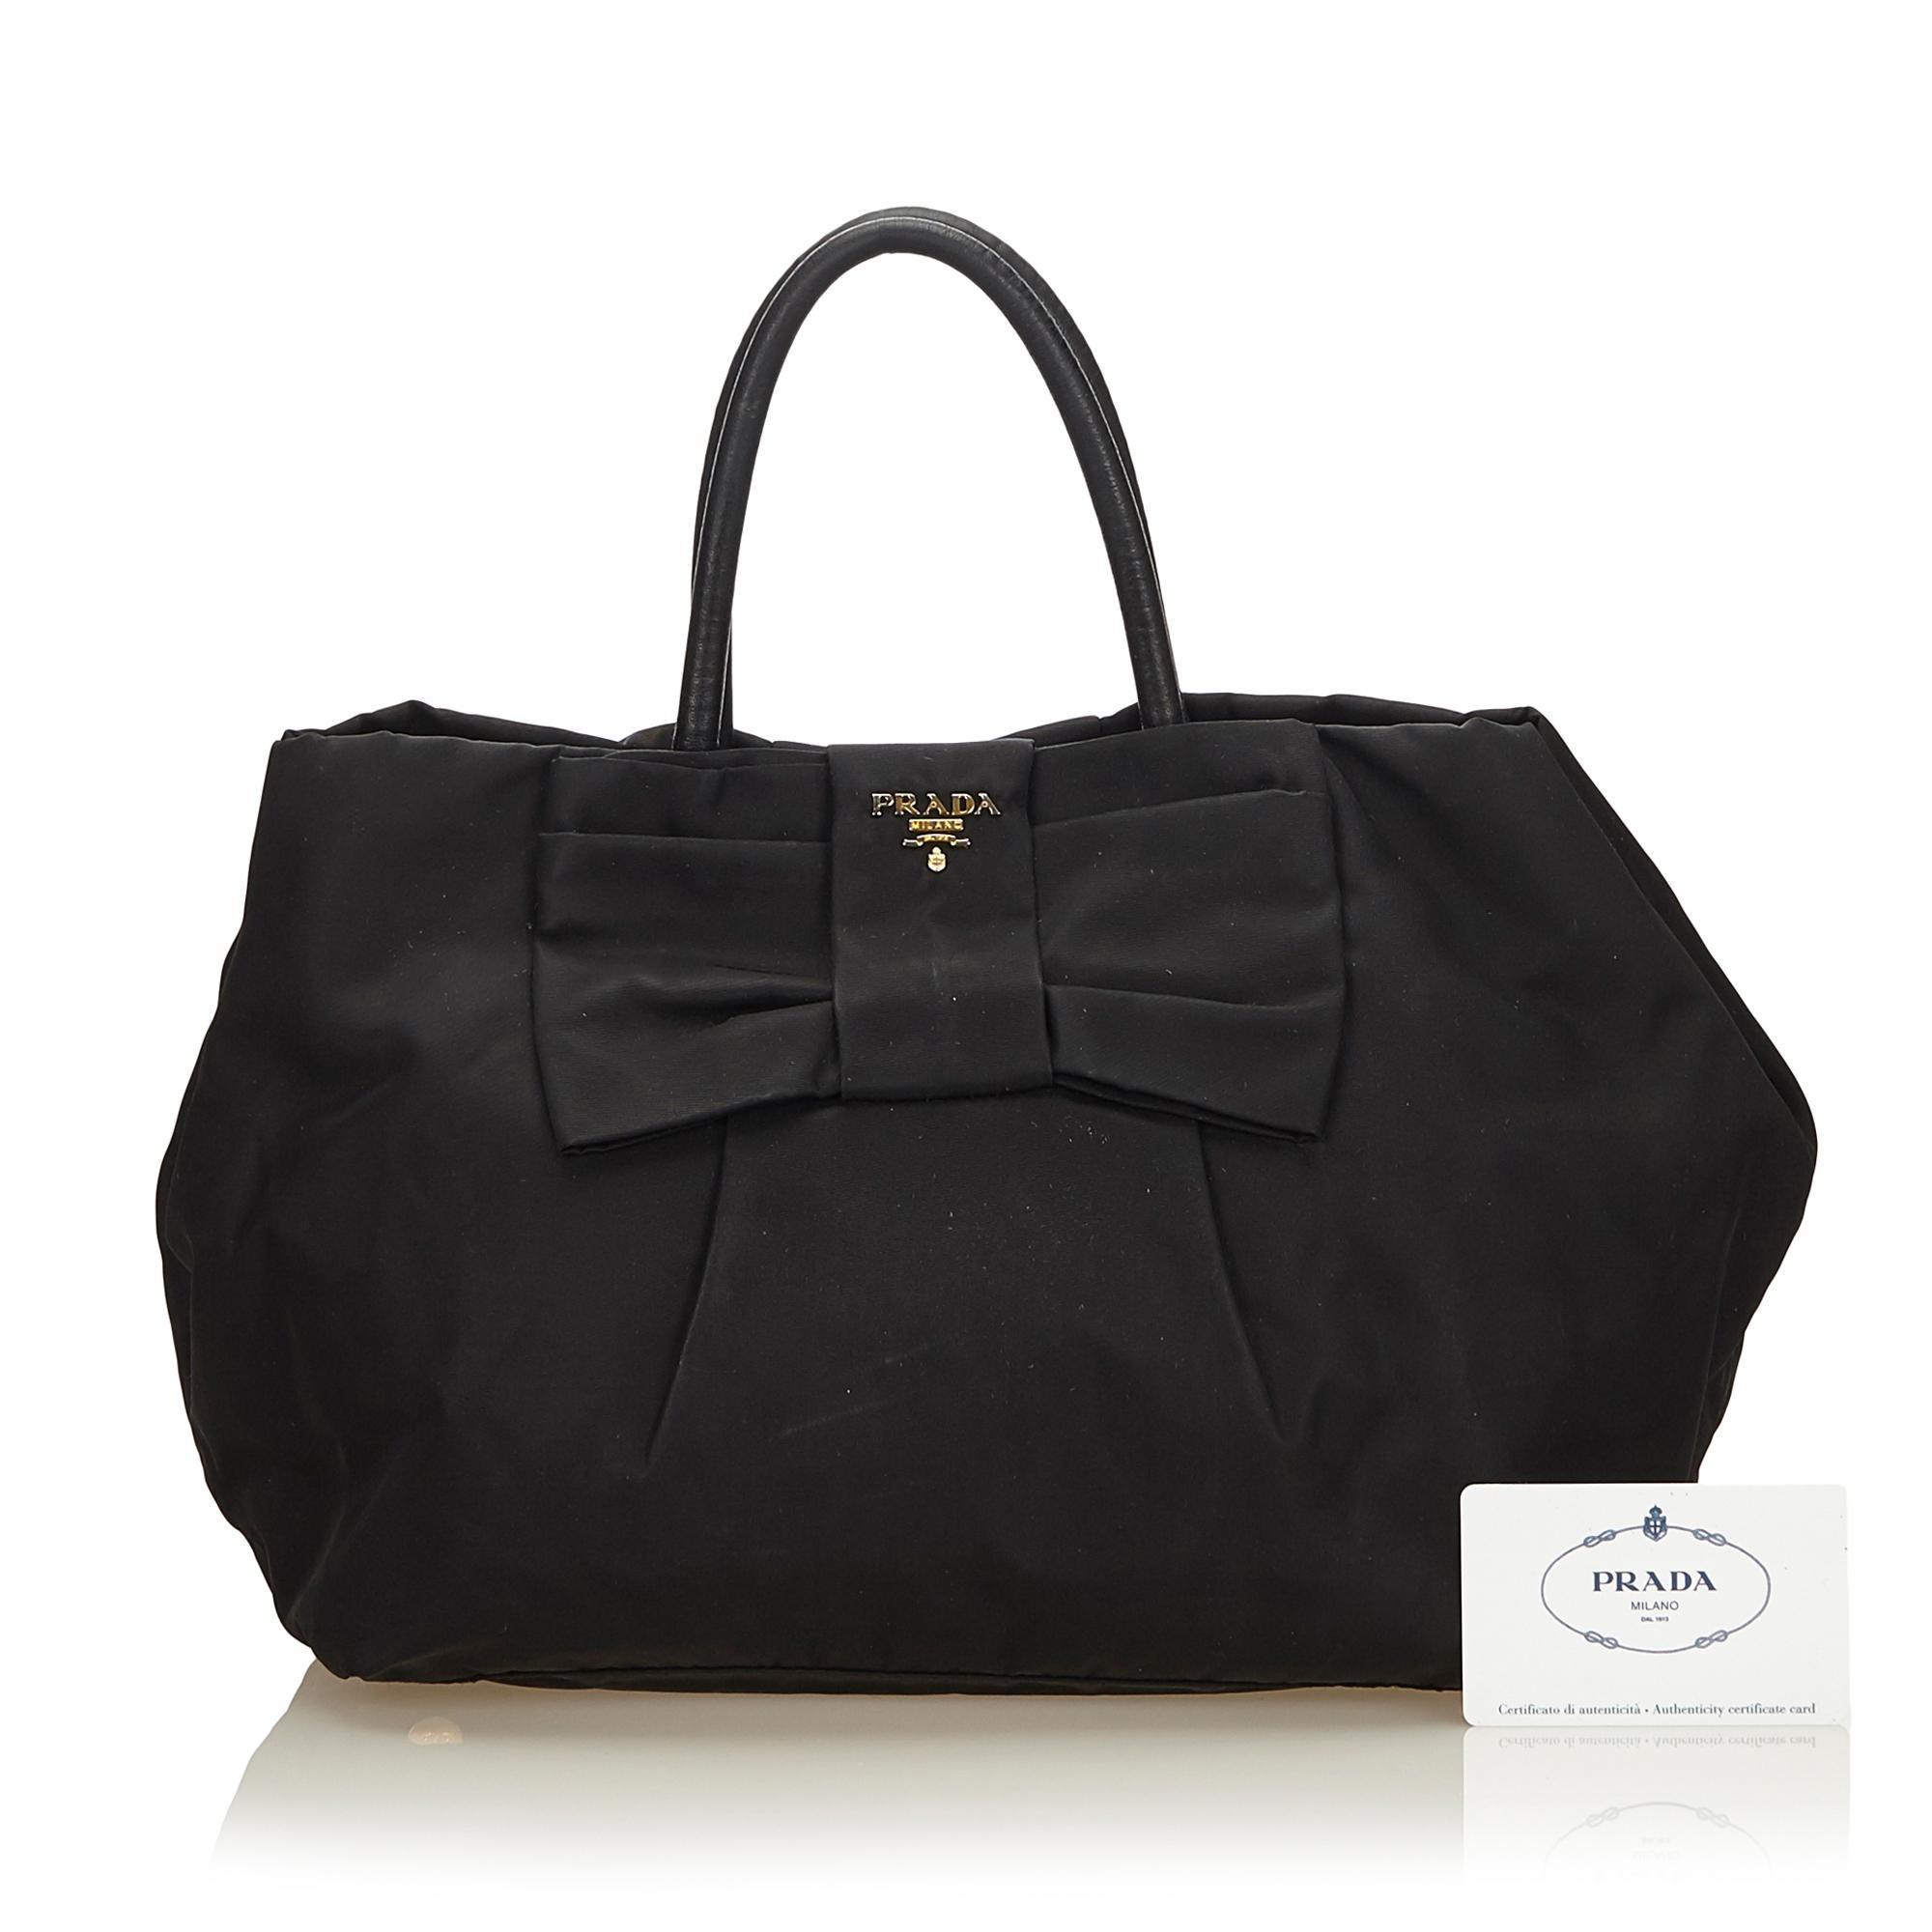 021d3ff5aa0c Prada Black Tessuto Nylon Bow Handbag at 1stdibs